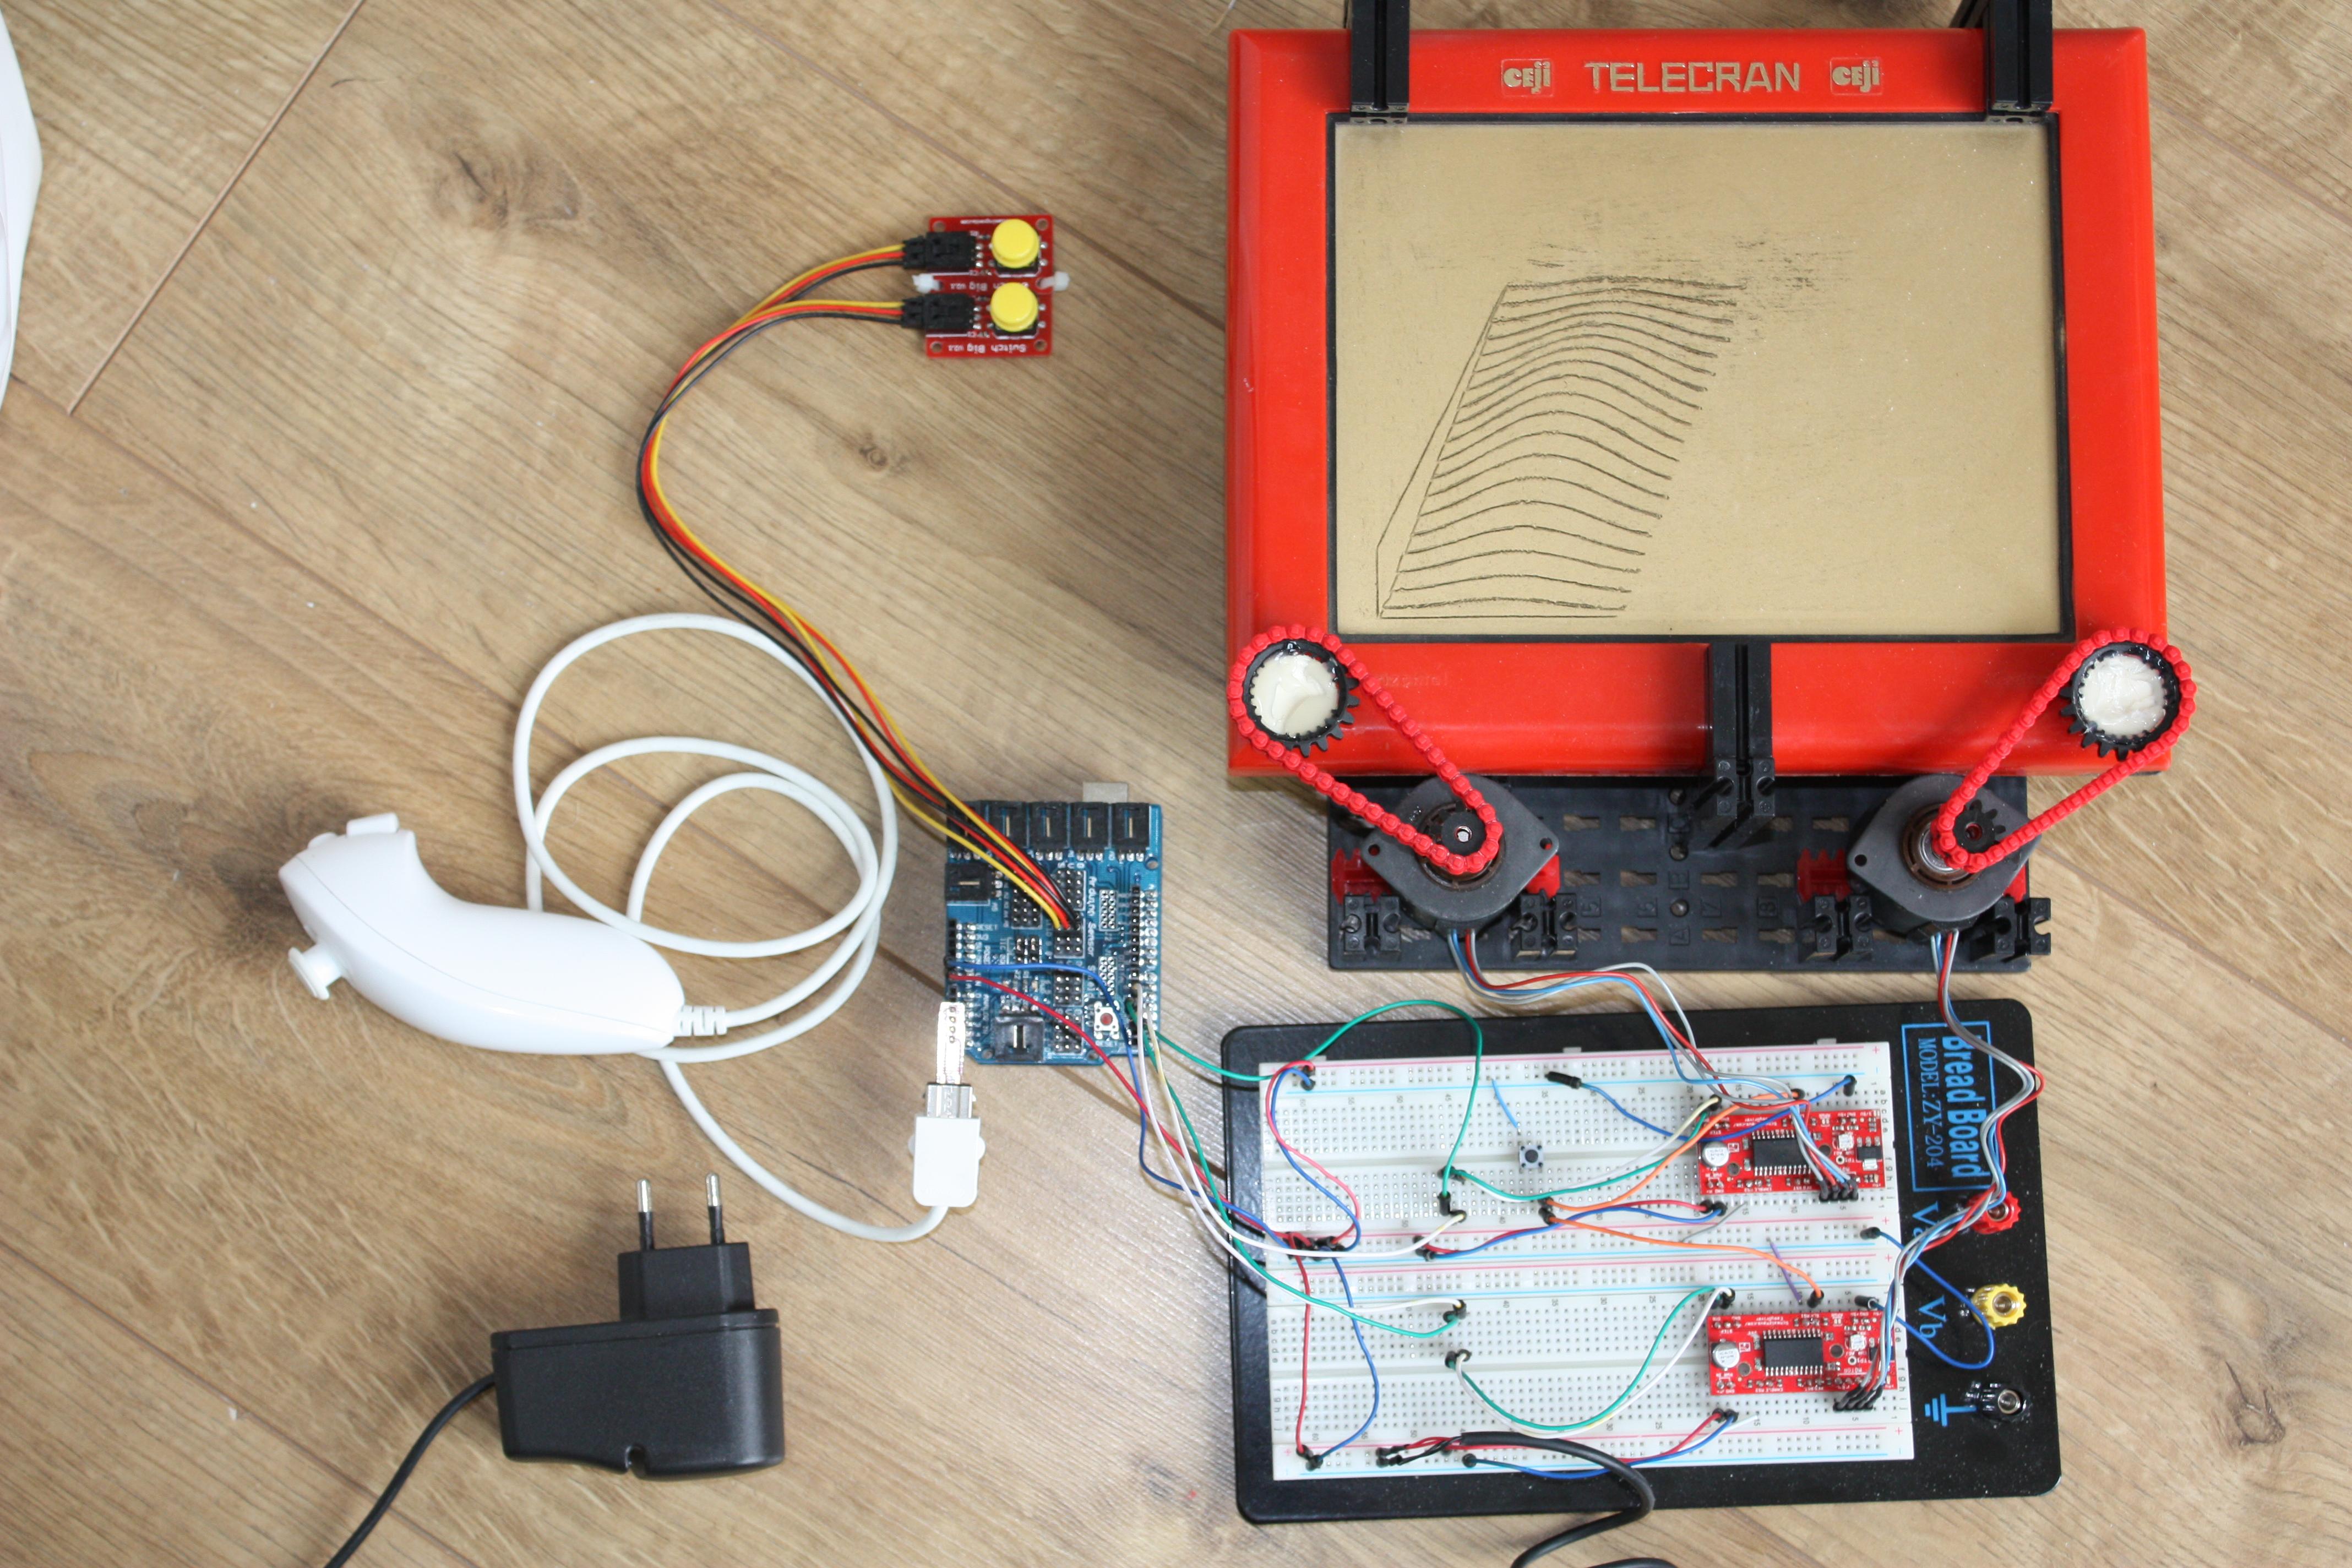 Telecran (Etch a Sketch) + Arduino = Telecranduino !